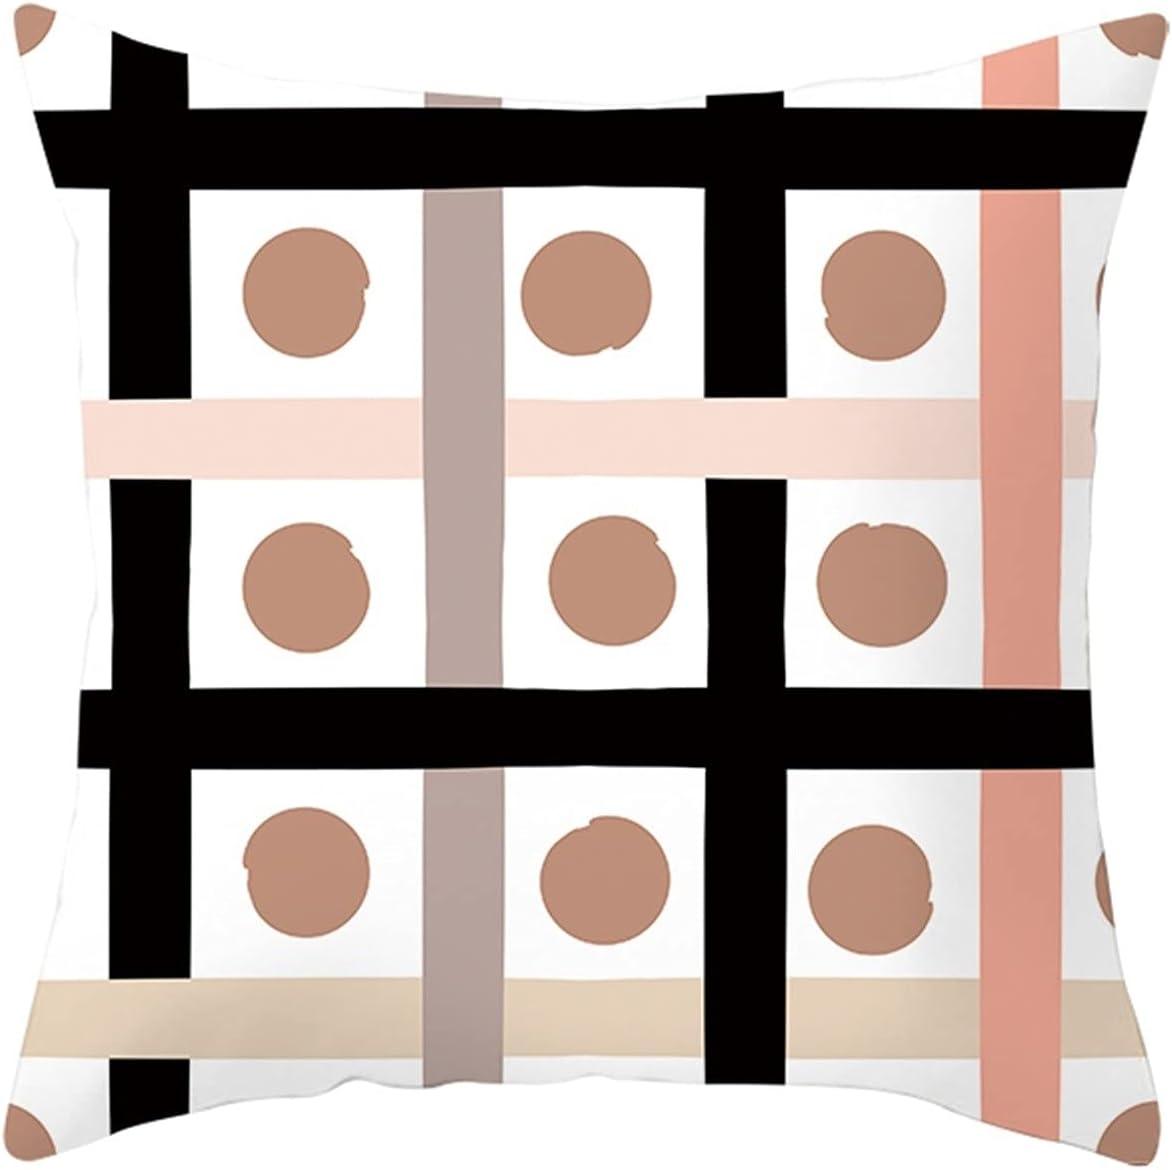 Daesar Soft Throw Pillow Super beauty product restock quality top [Alternative dealer] Covers Sofa Case Black White P Cushion